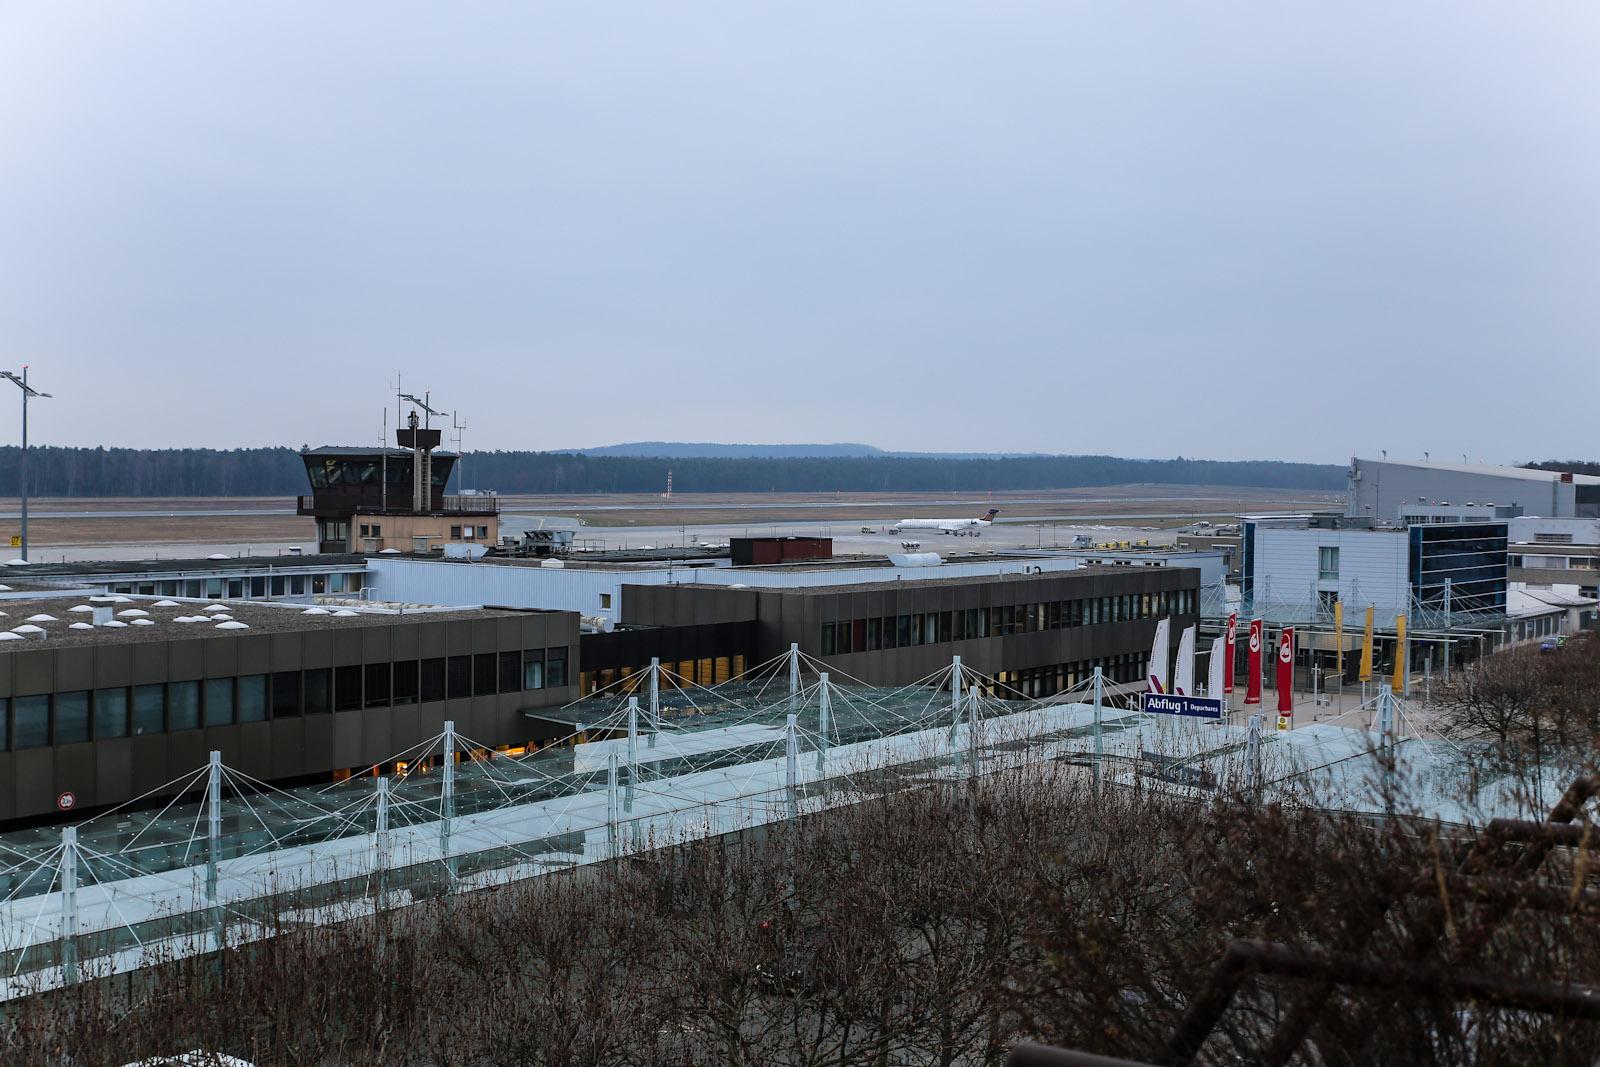 Правое крыло аэровокзала аэропорта Нюрнберг